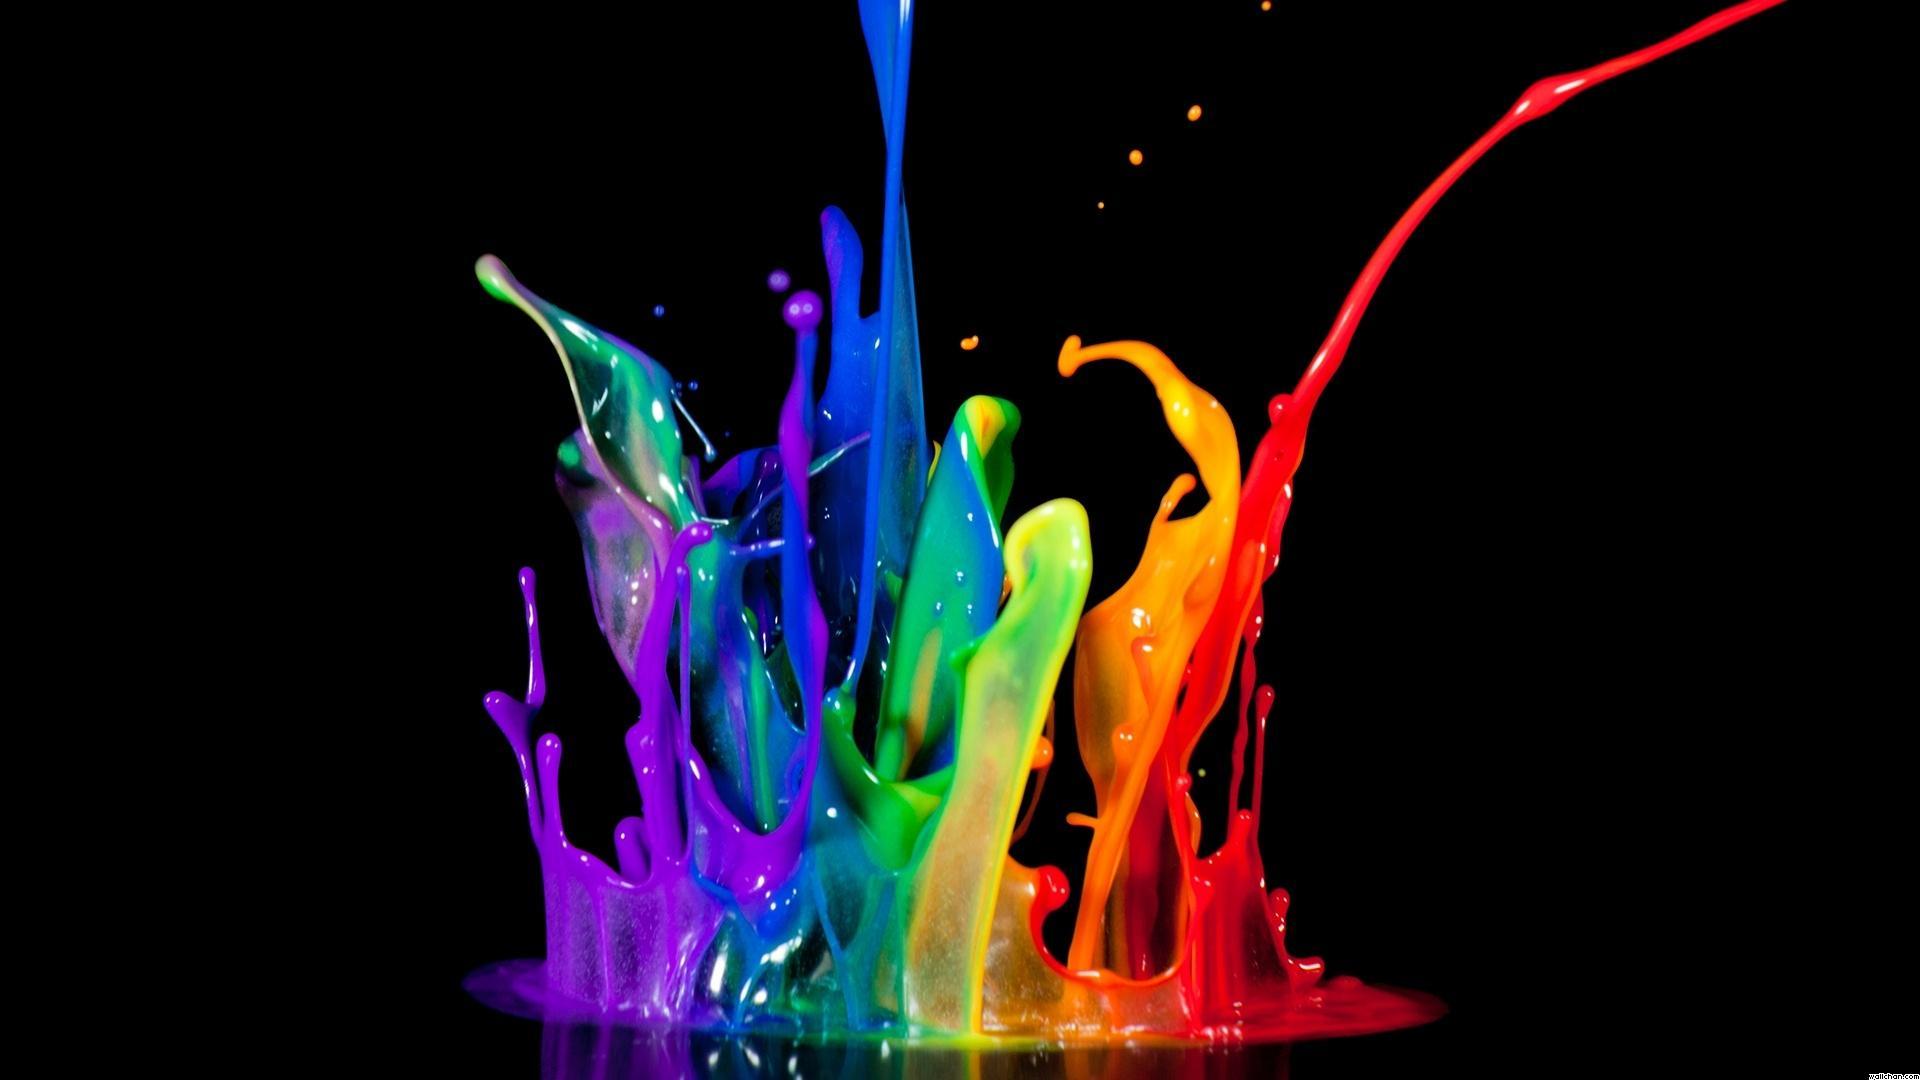 Colorful-Desktop-p-HD-Go-ask-Alice-Pinterest-wallpaper-wpc9003675